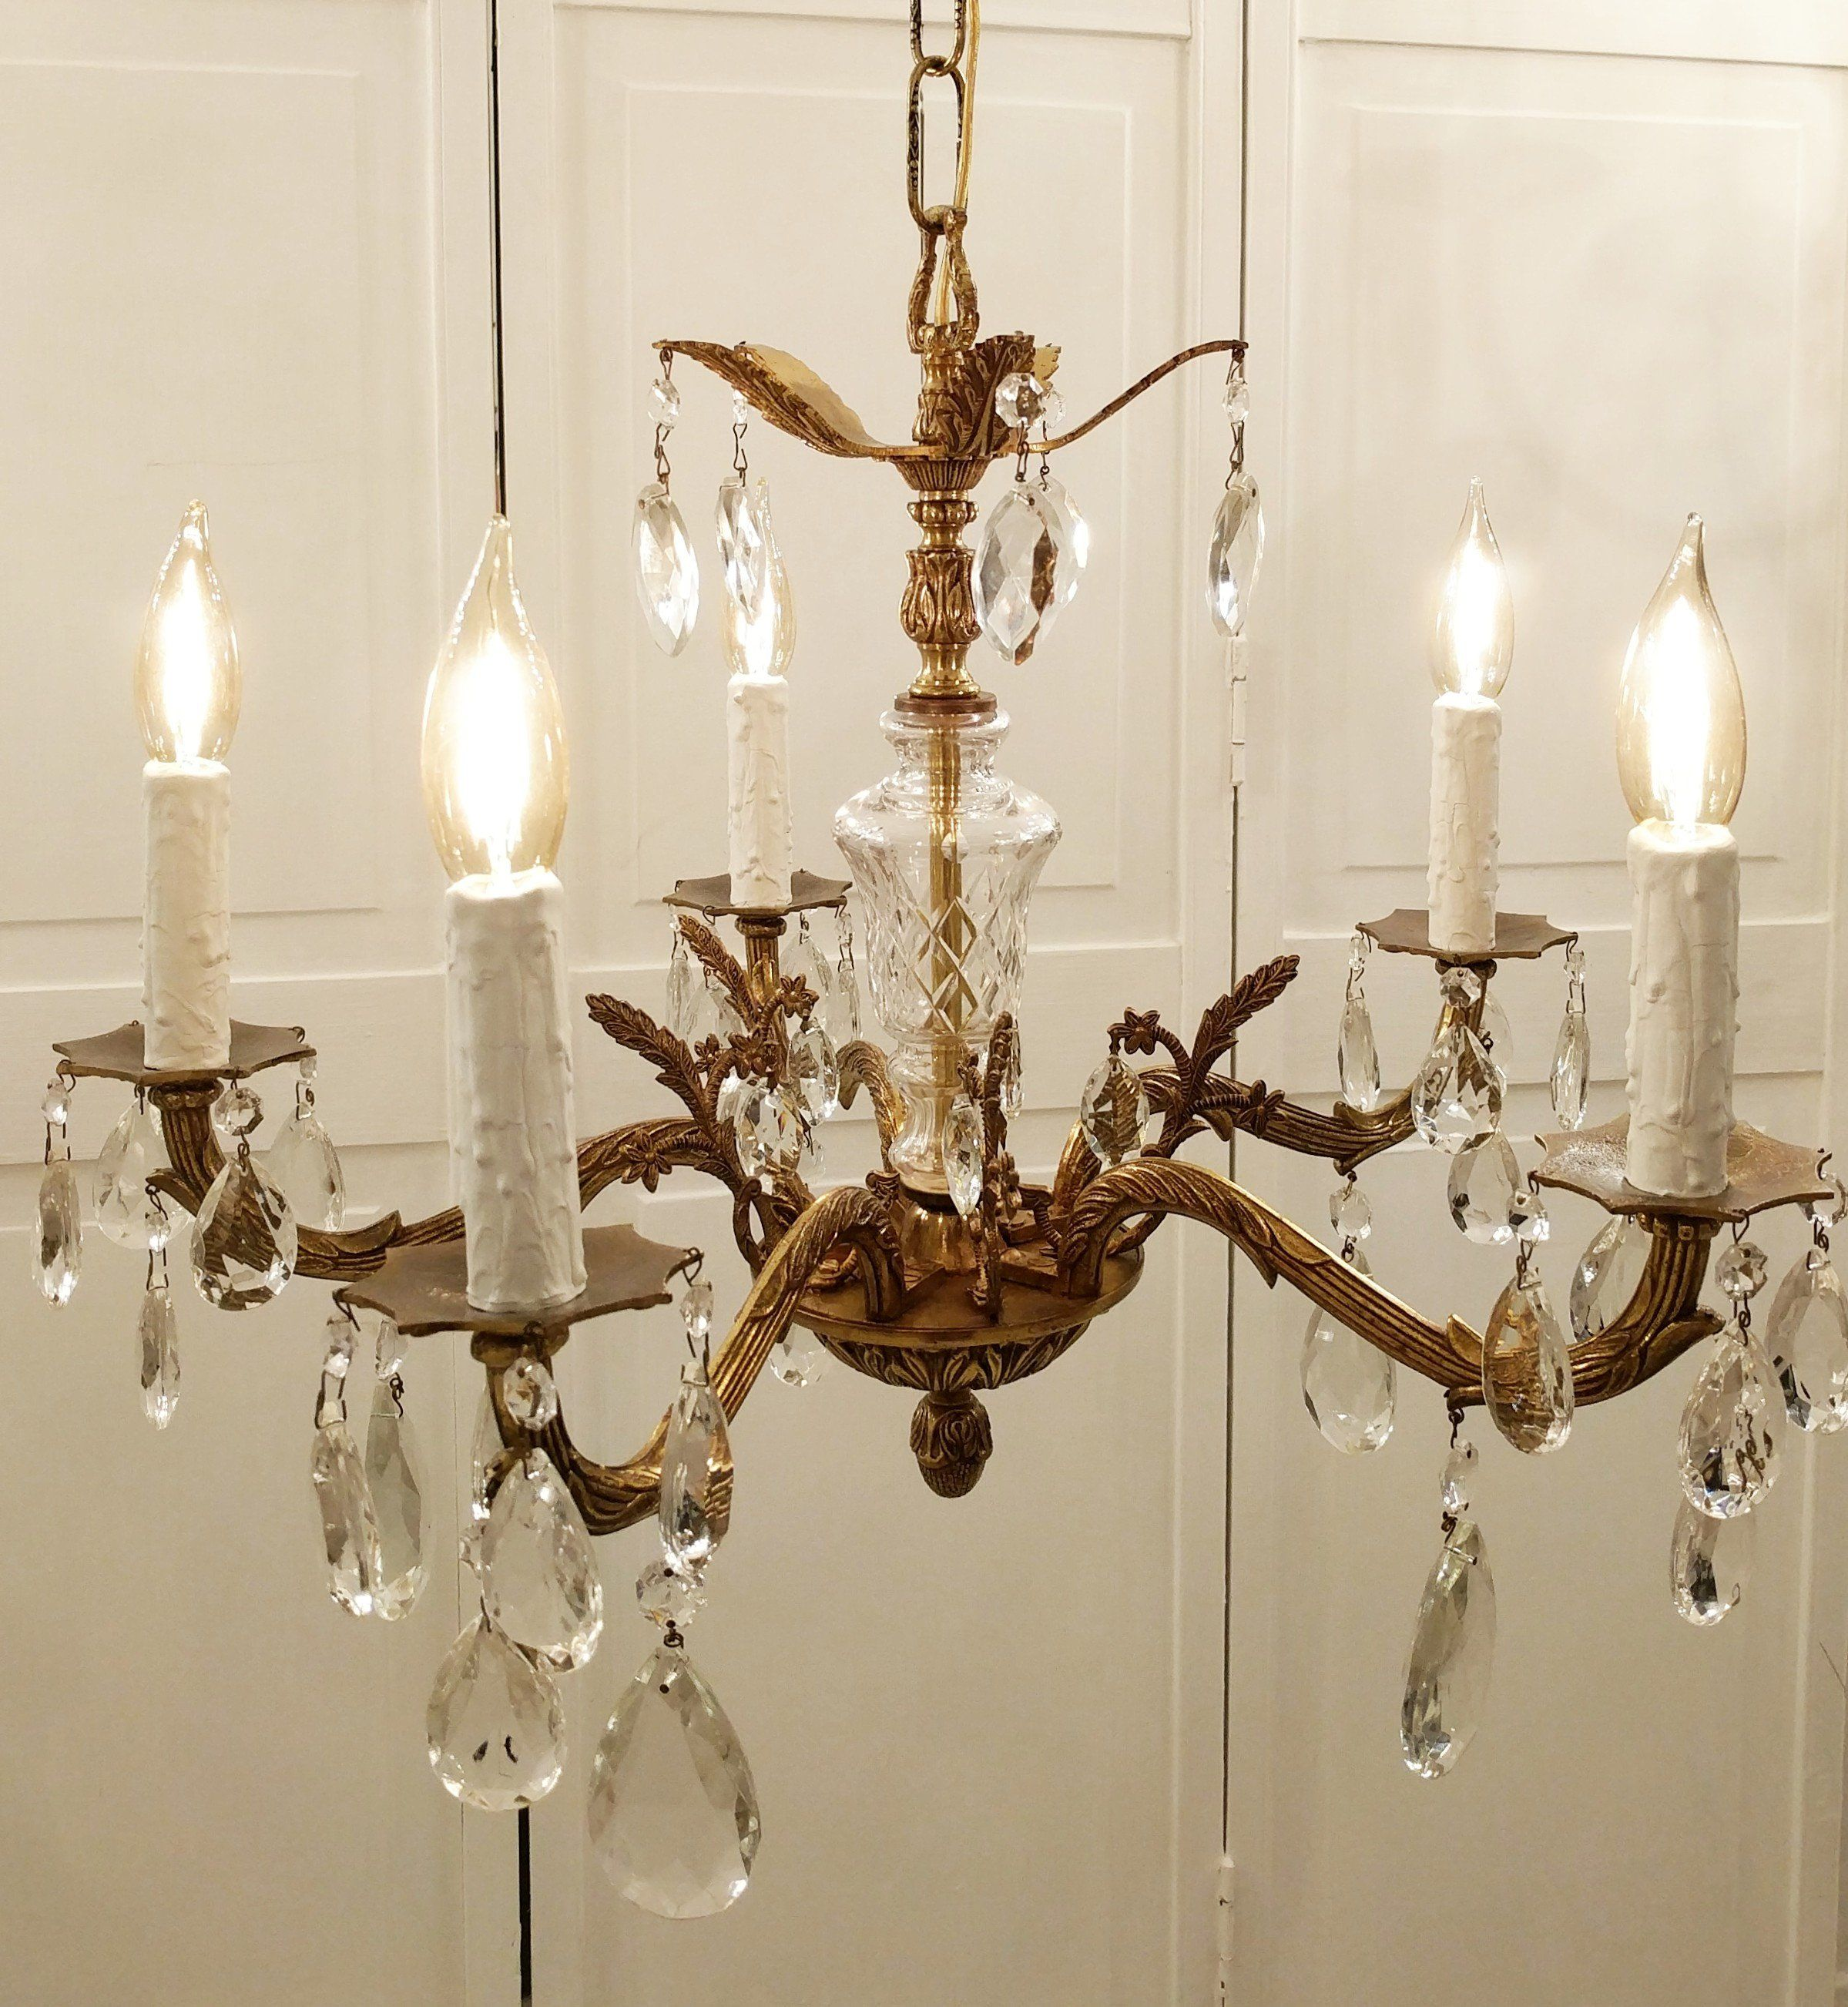 Vintage Chandelier Chandelier Lighting Bespoke Lighting Spanish